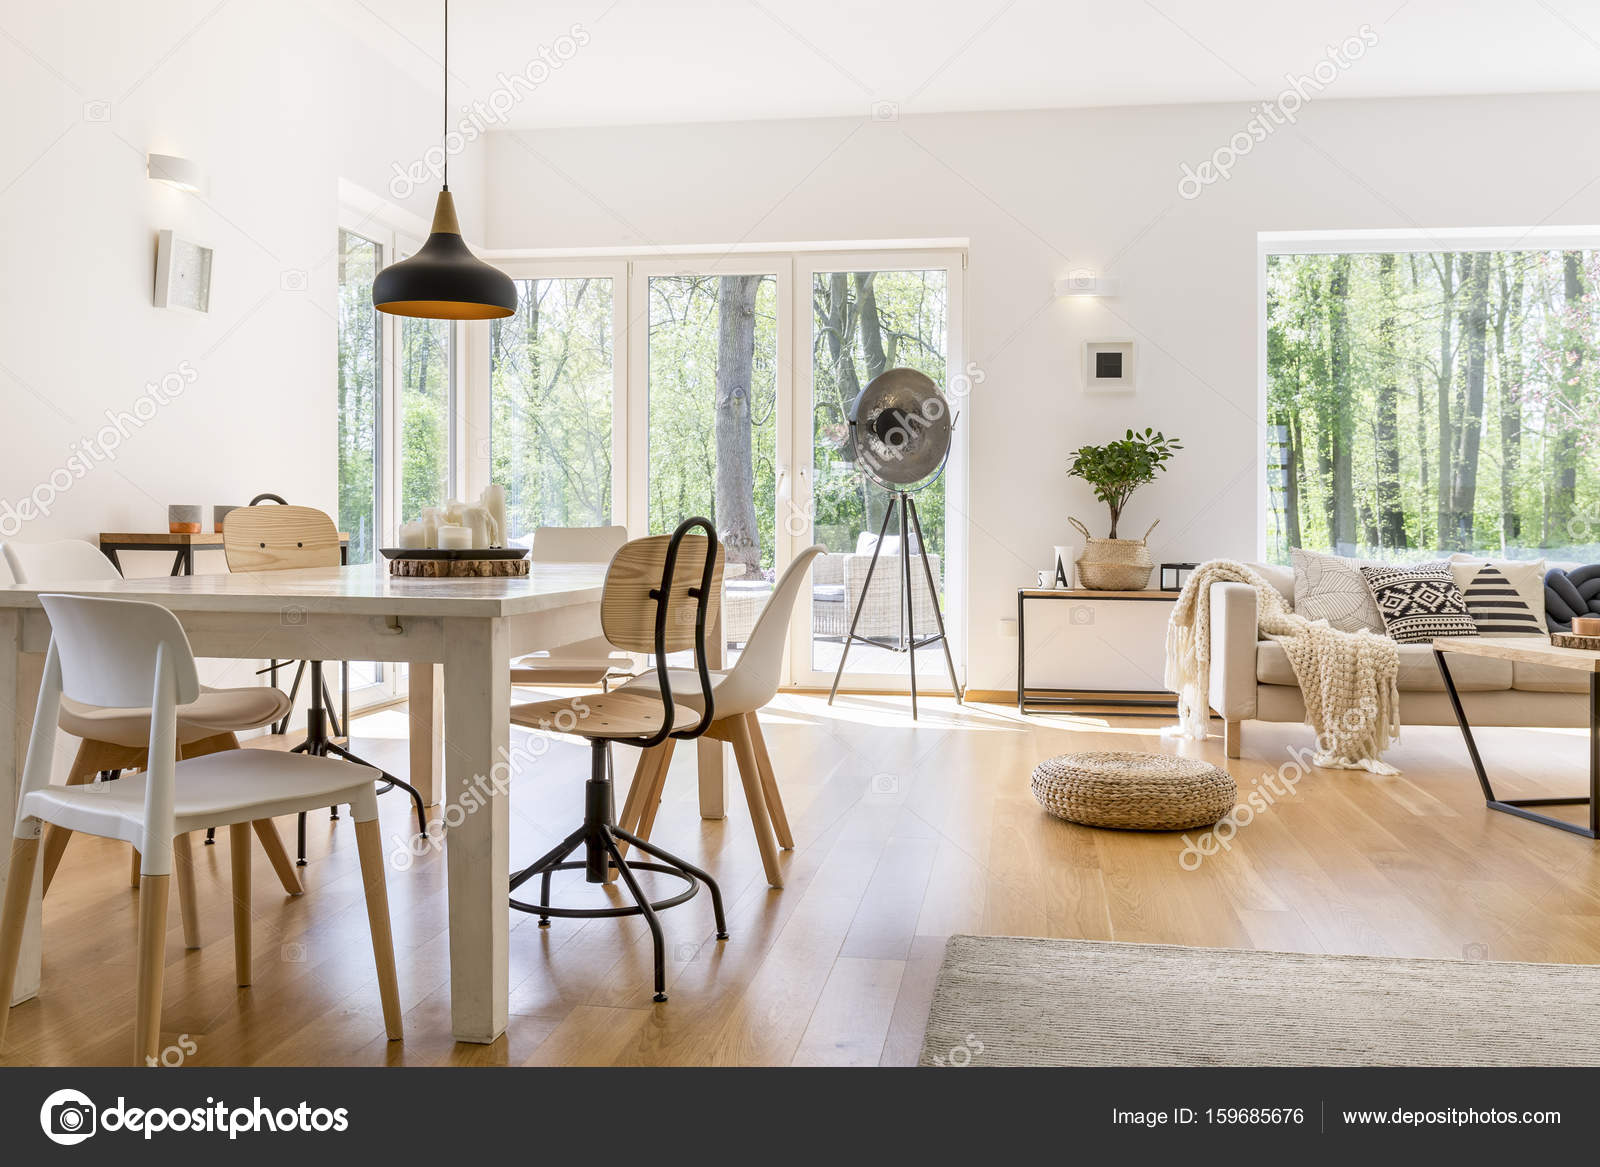 Diner ruimte in lounge u2014 stockfoto © photographee.eu #159685676